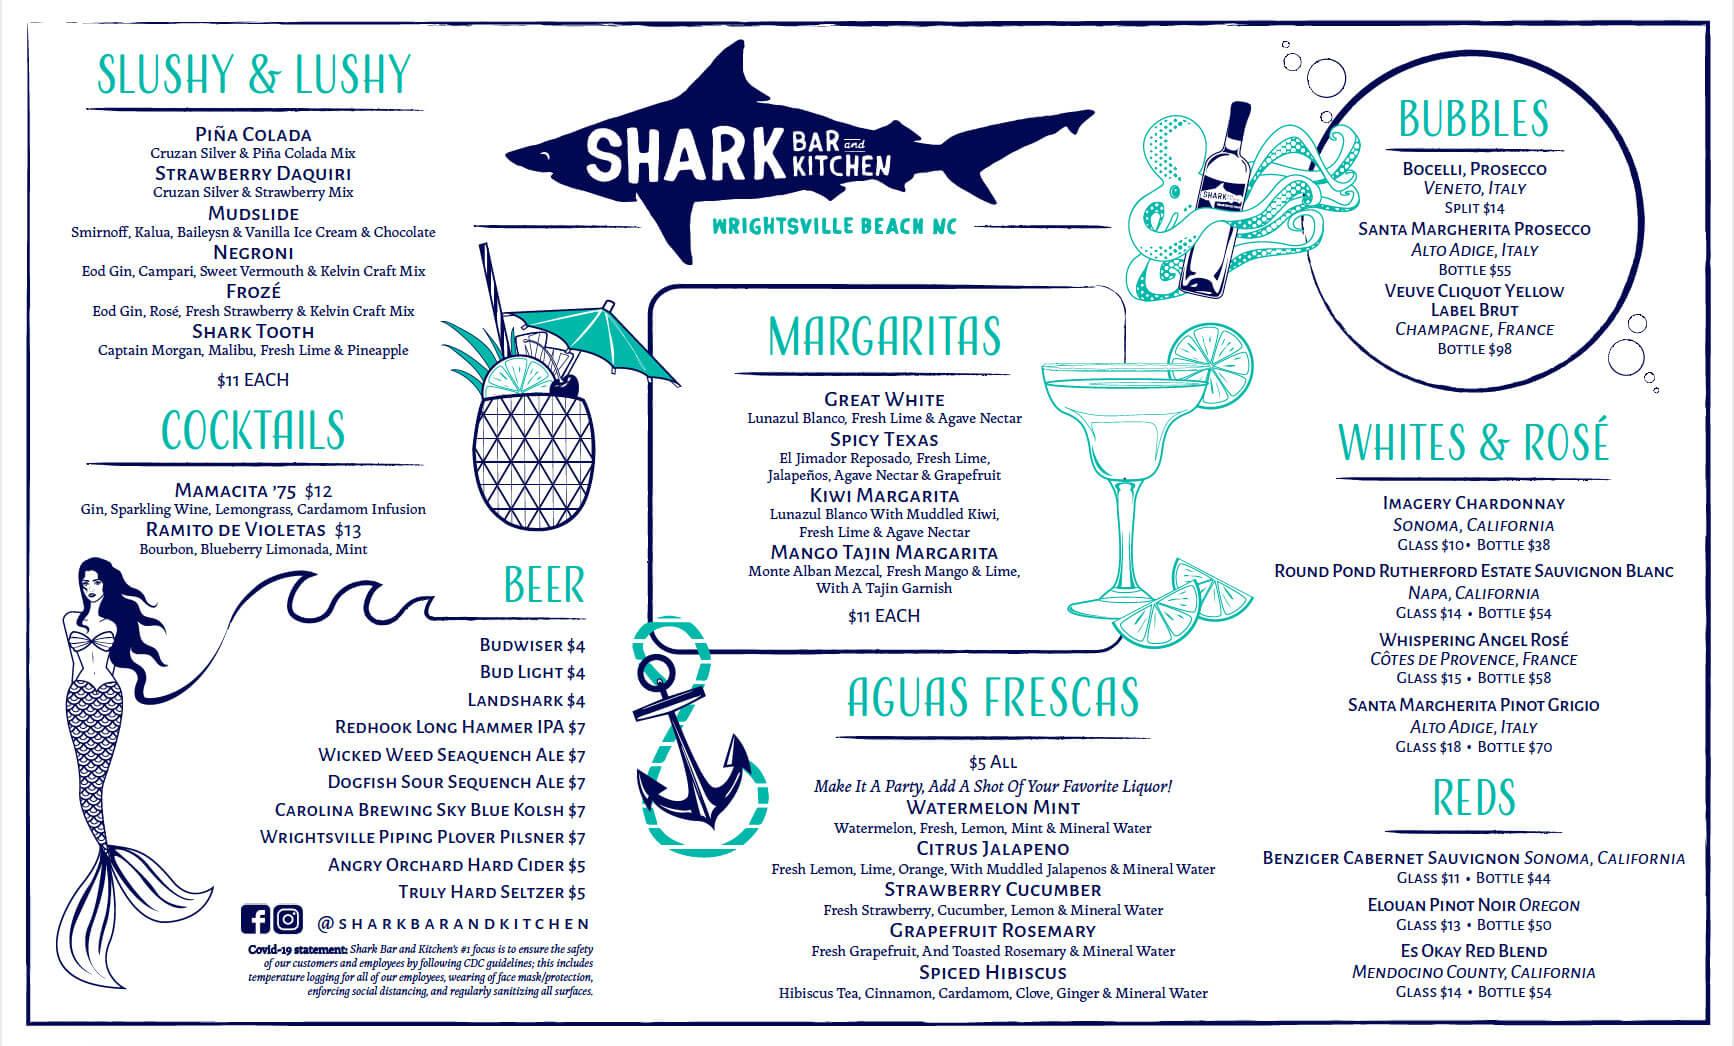 Shark Bar Drink Summer Menu 2021